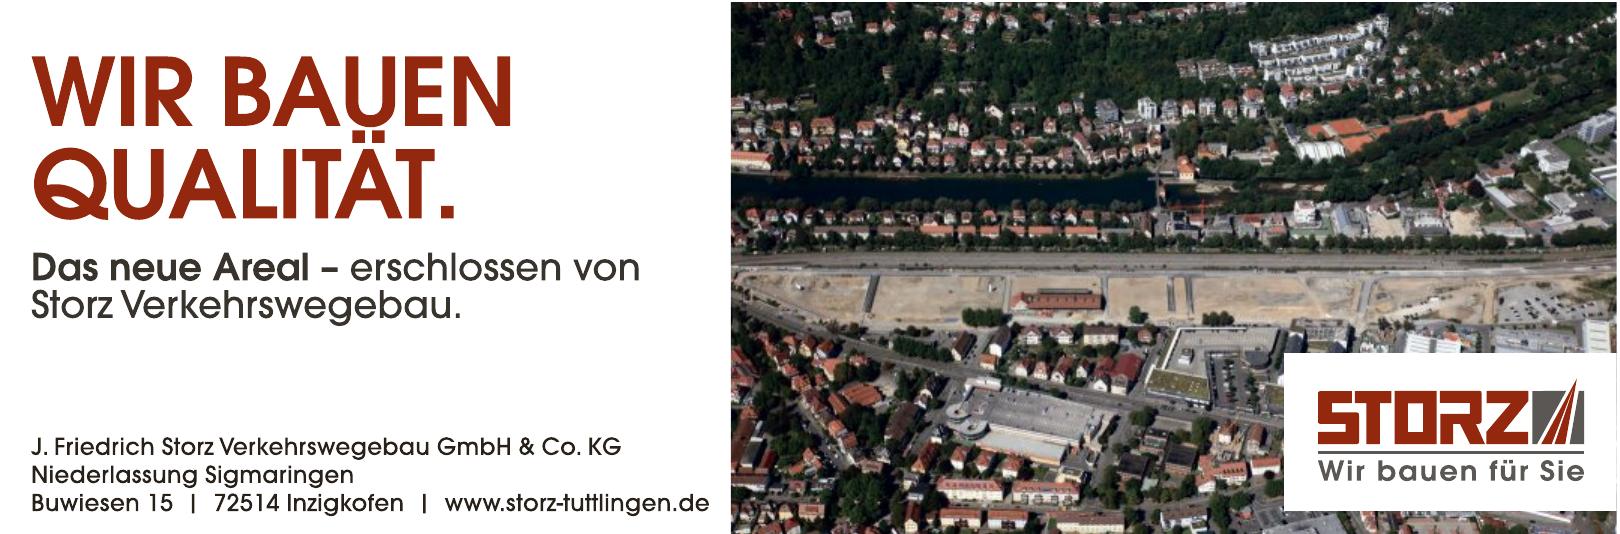 J. Friedrich Storz GmbH & Co. KG